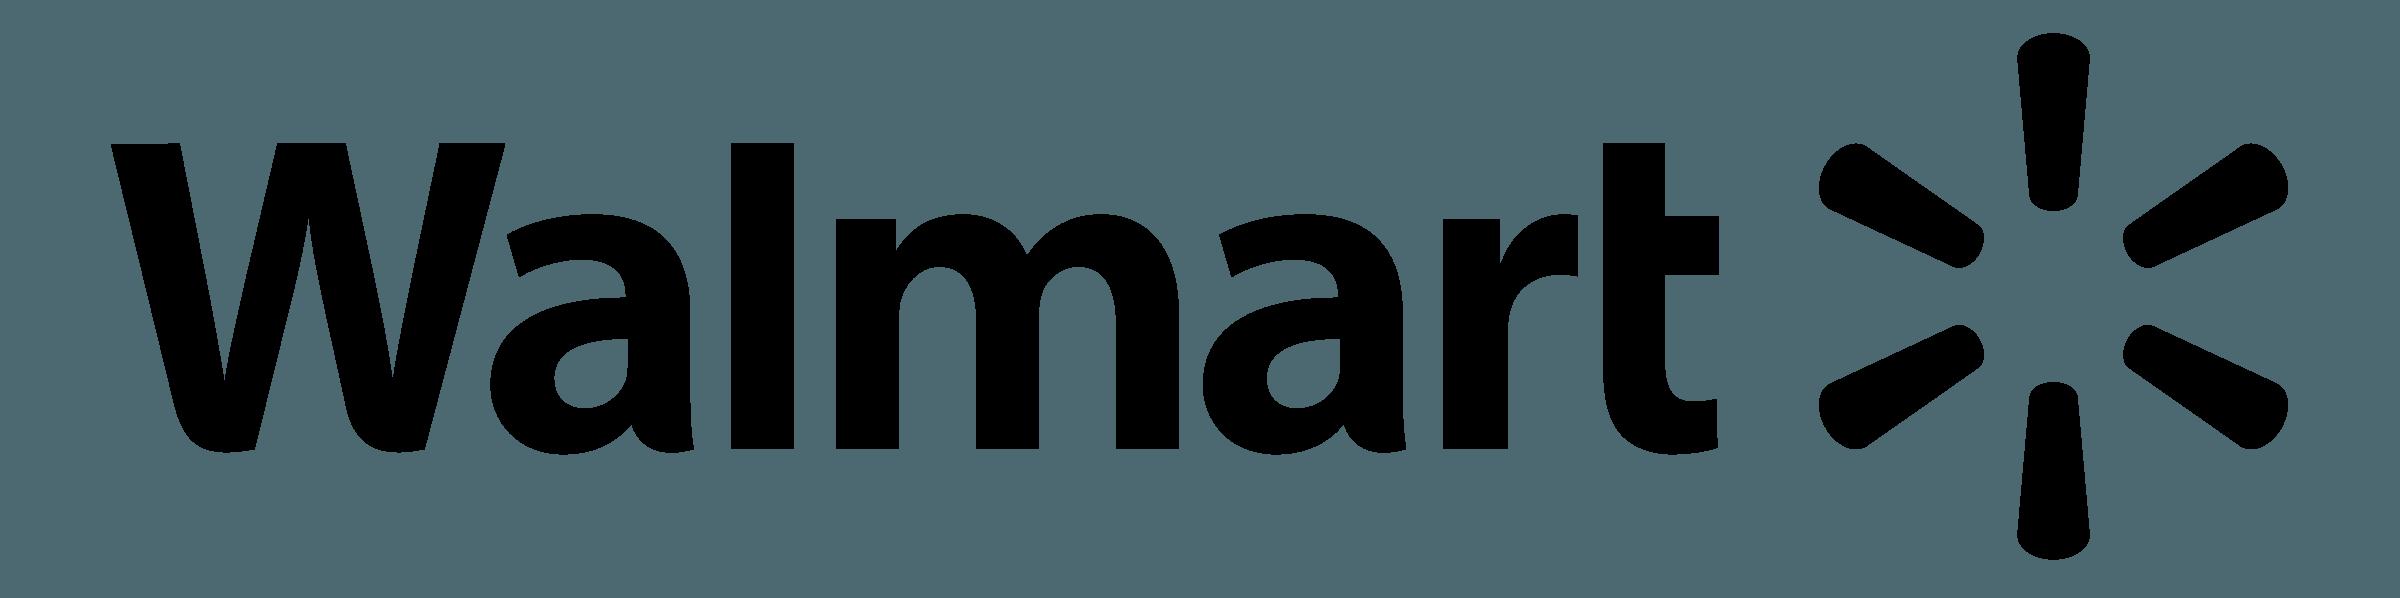 Walmart Logo Black White